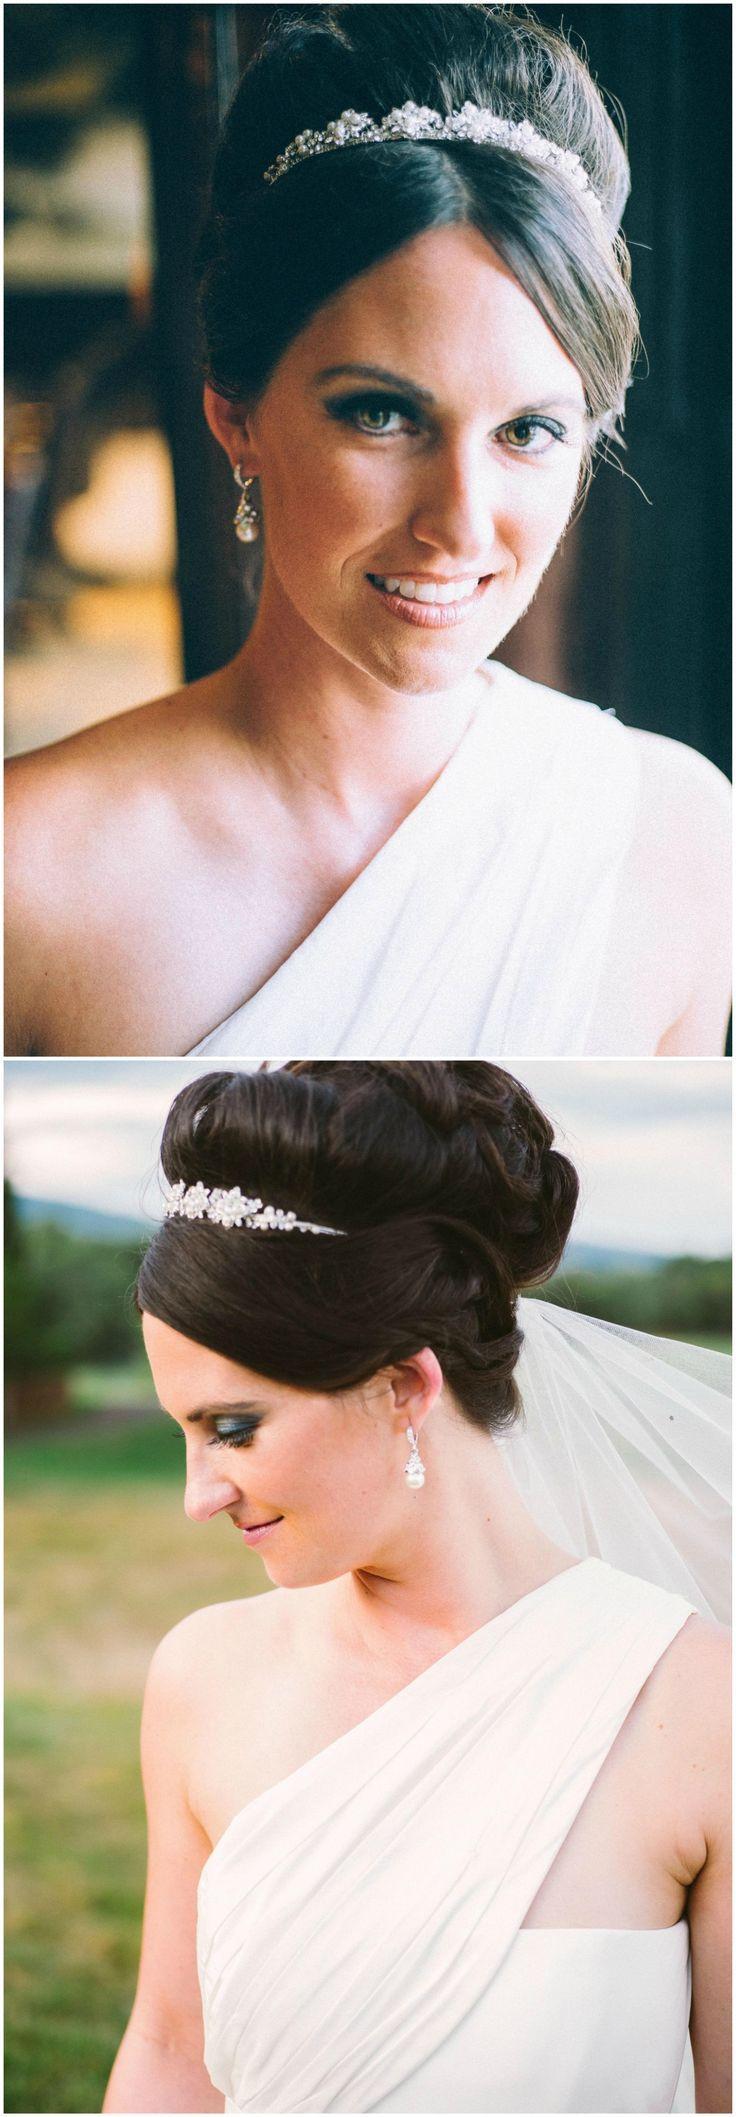 Formal bridal hairstyle, elegant wedding up-do, smoky eye, pearl drop earrings, glam headband // Sam Stroud Photography - New Site